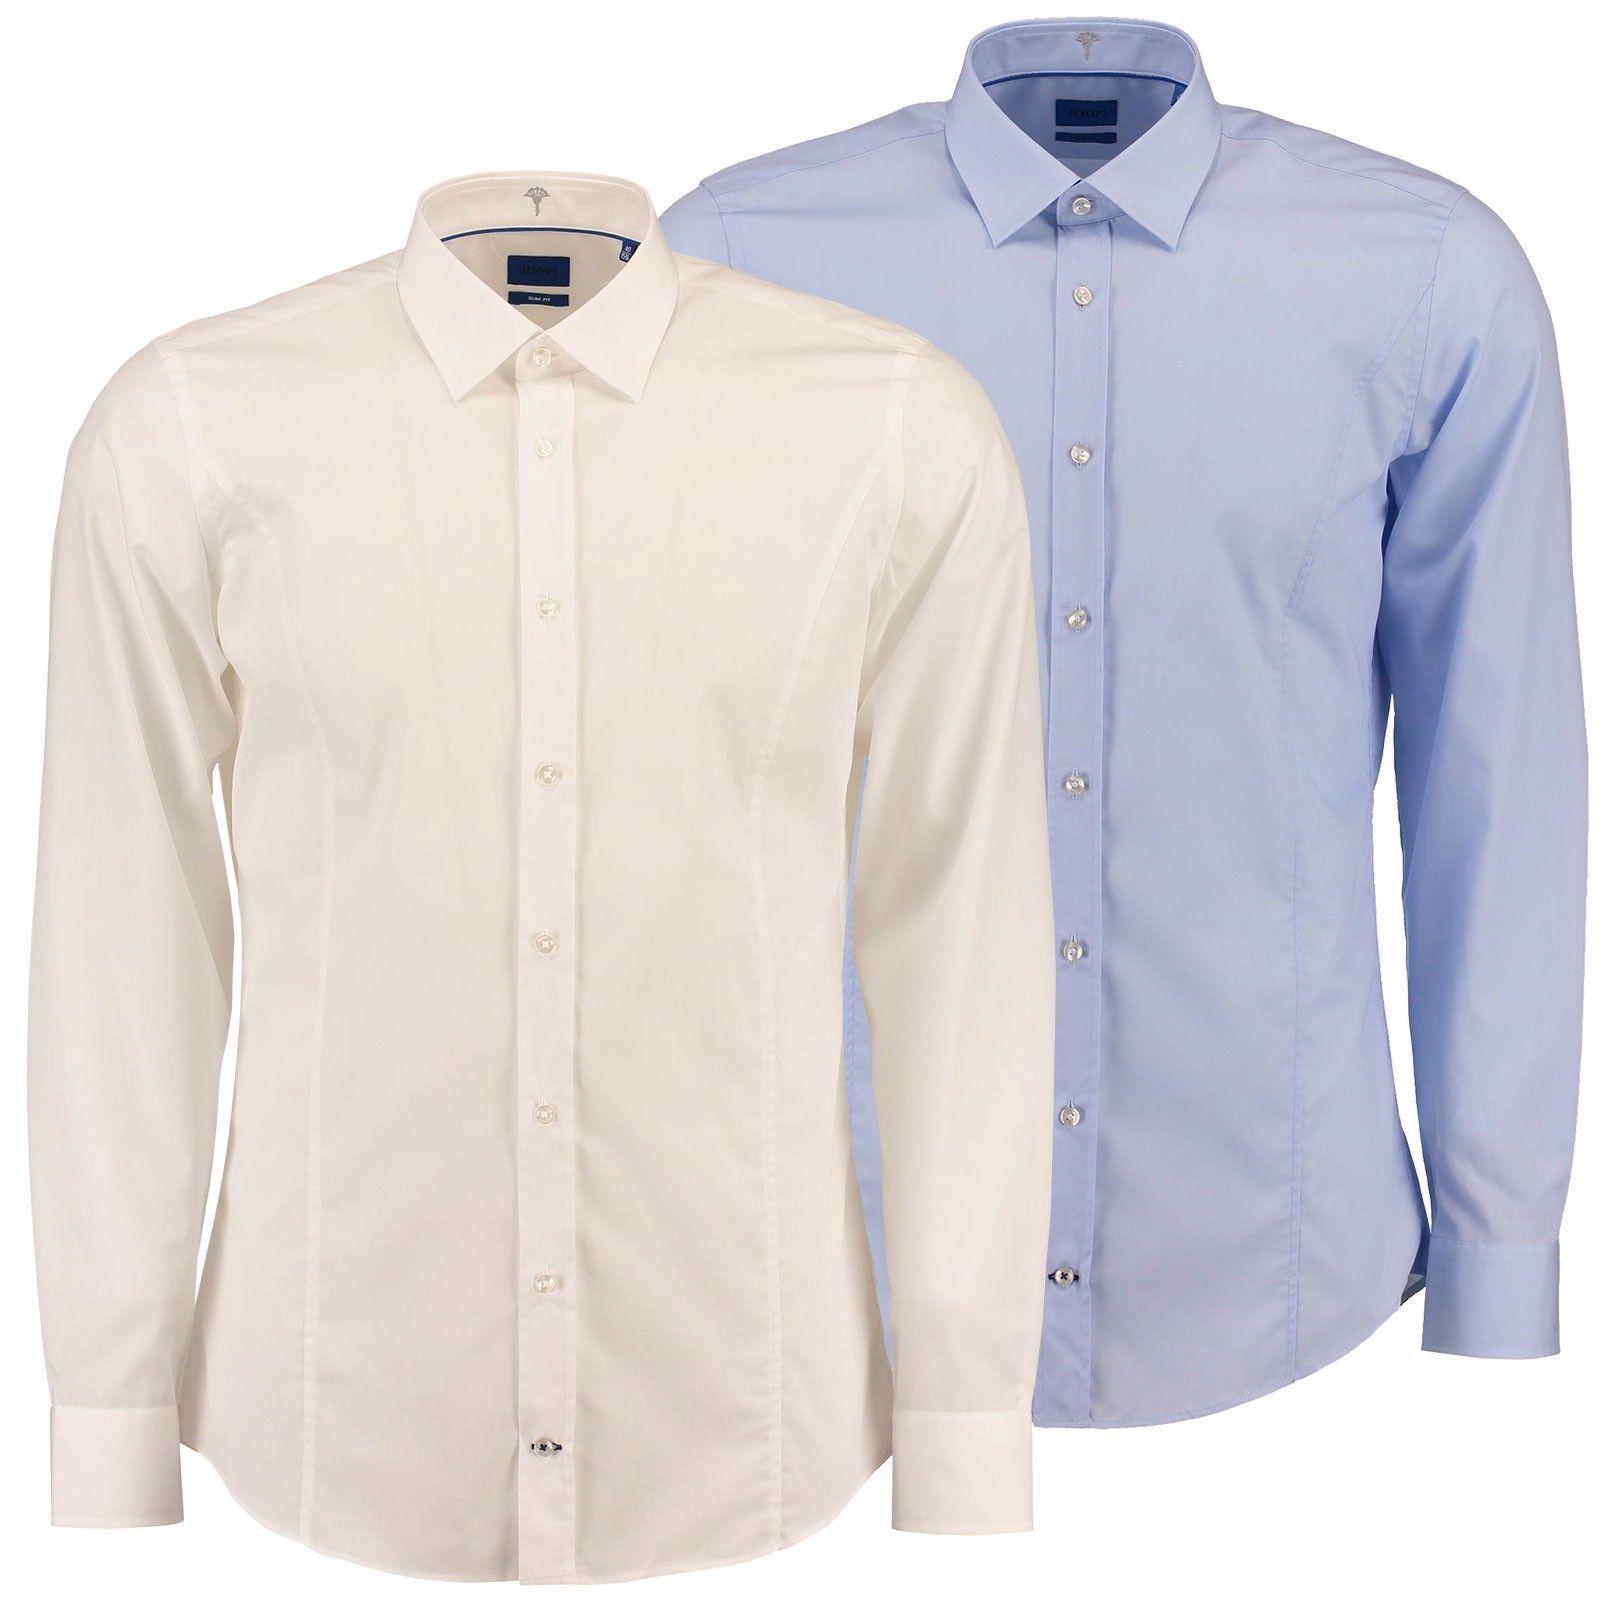 Joop Hemden nur 35€ inkl. Versand (idealo 70€)